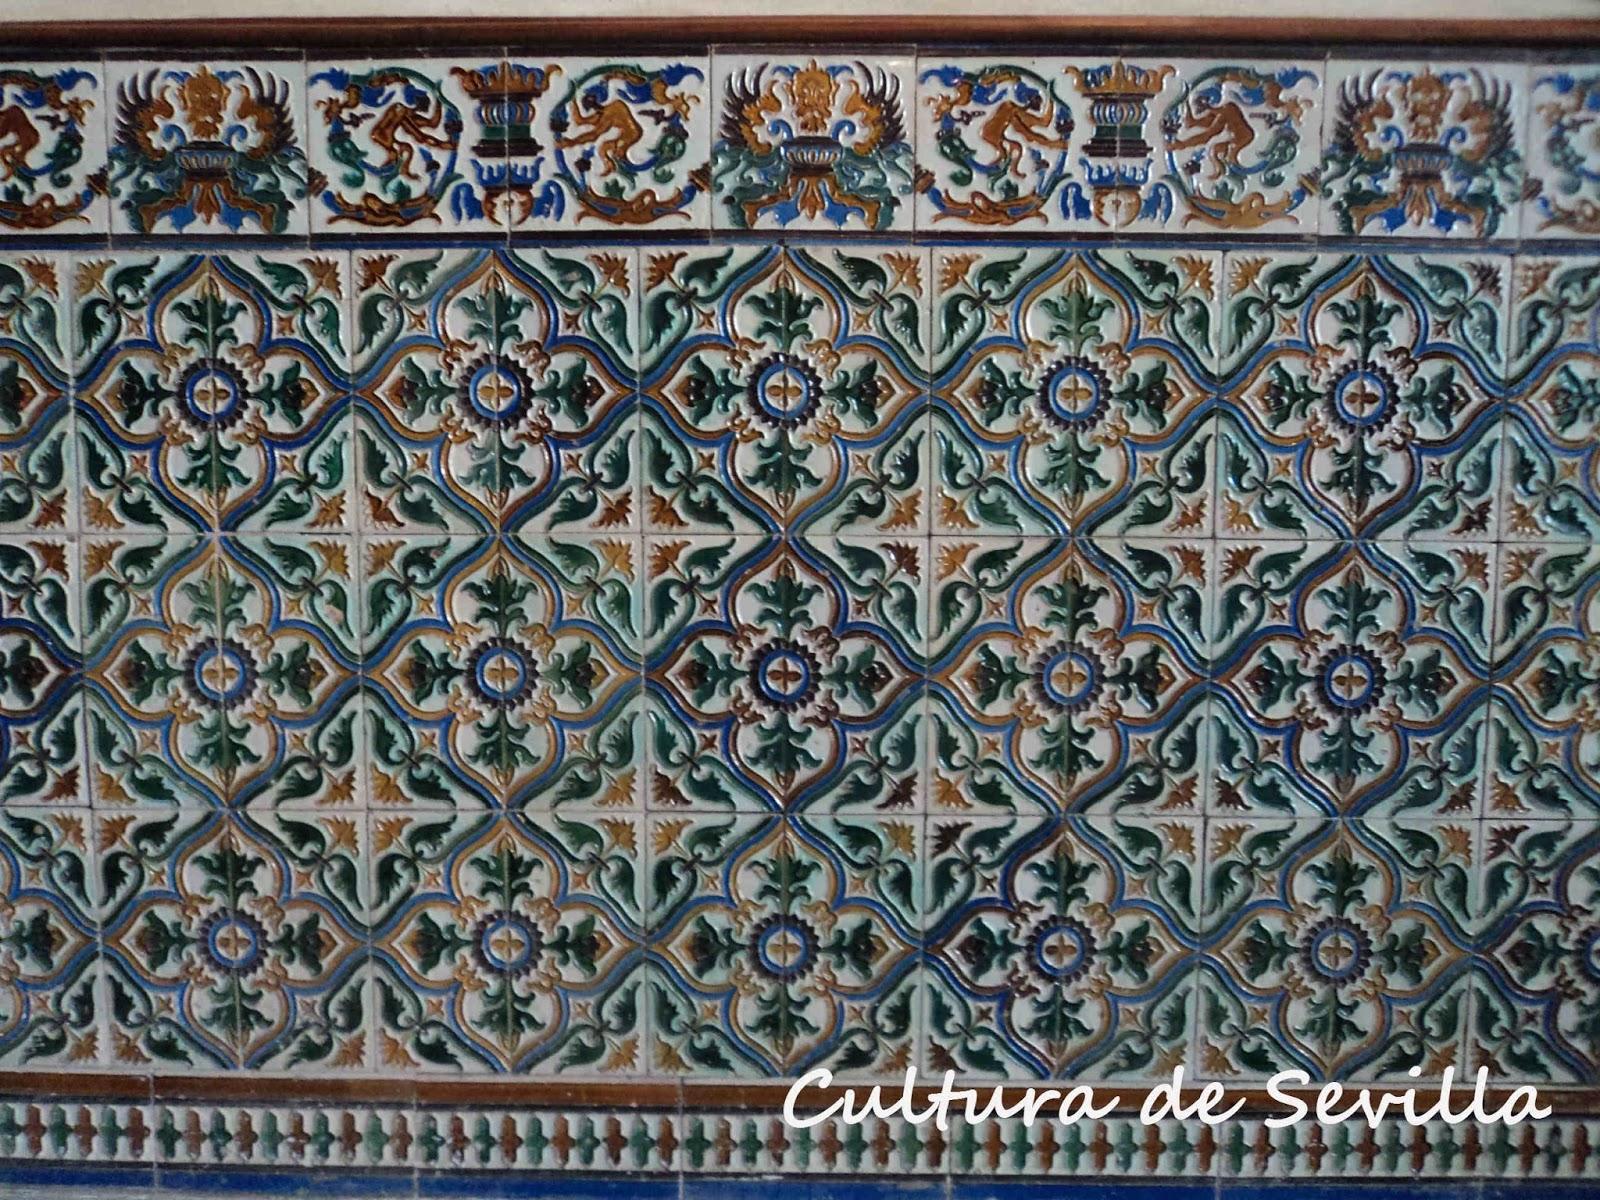 Cultura de sevilla azulejos sevillanos en la casa for Casa de azulejos cordoba